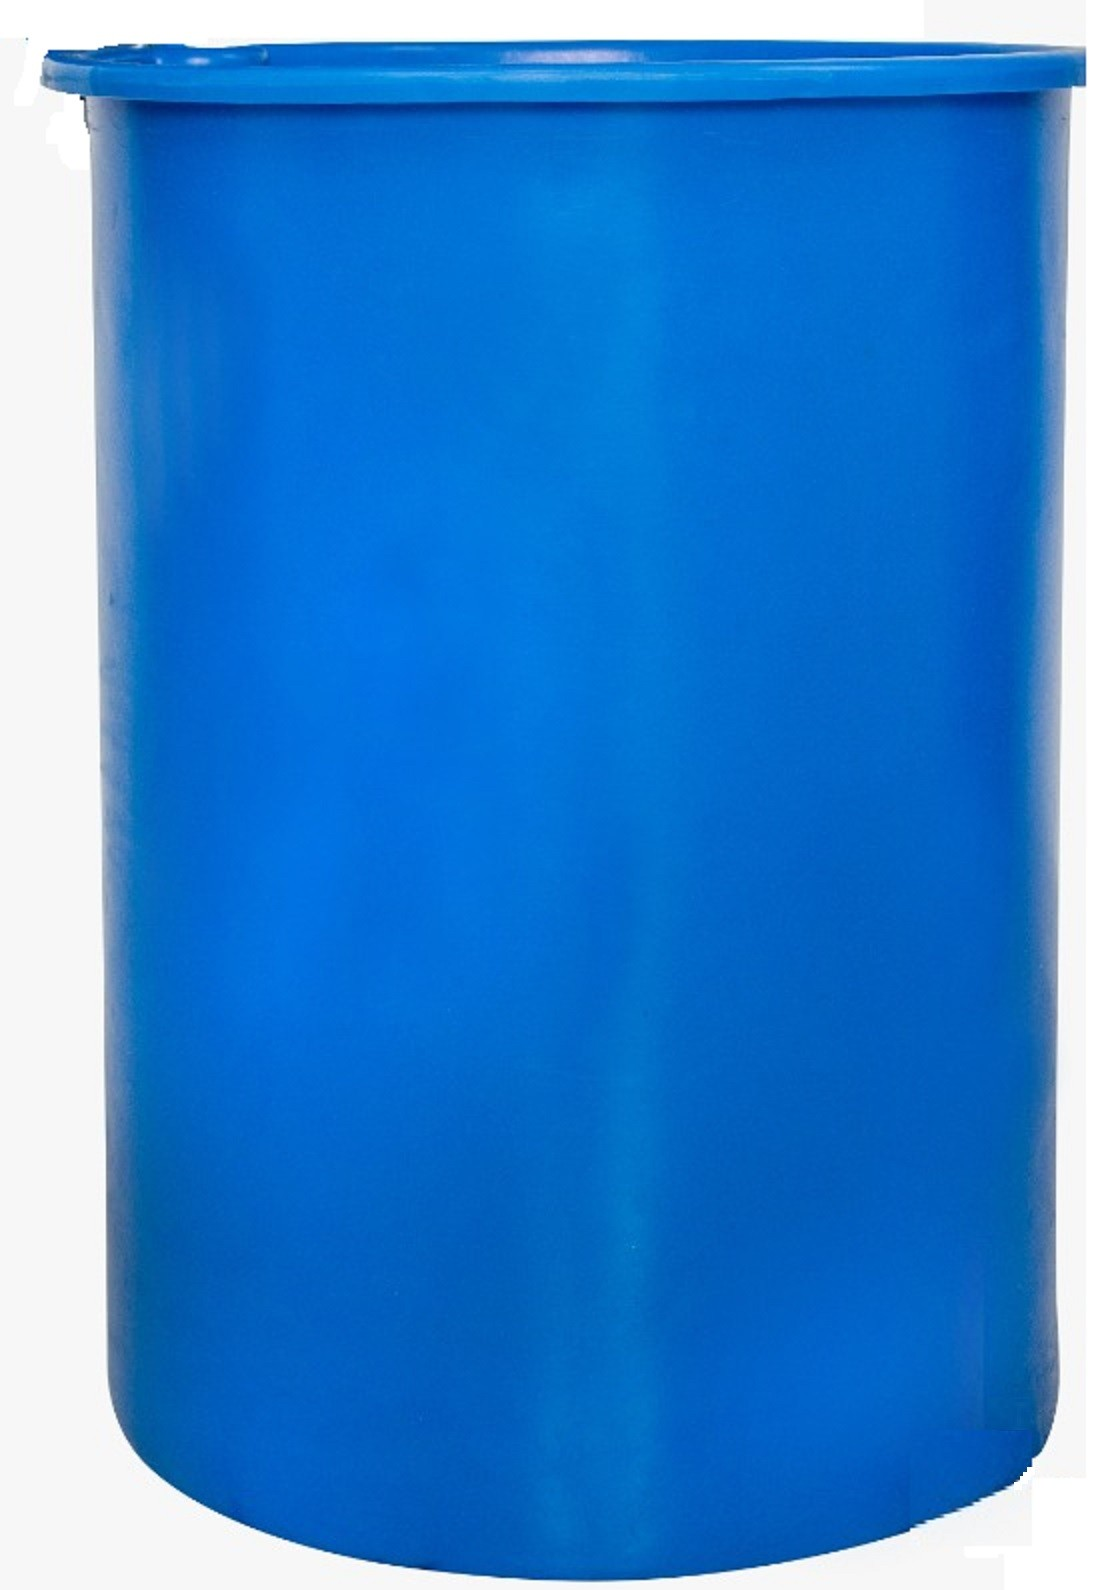 Cesto plástico redondo sem tampa capacidade de 200 Litros